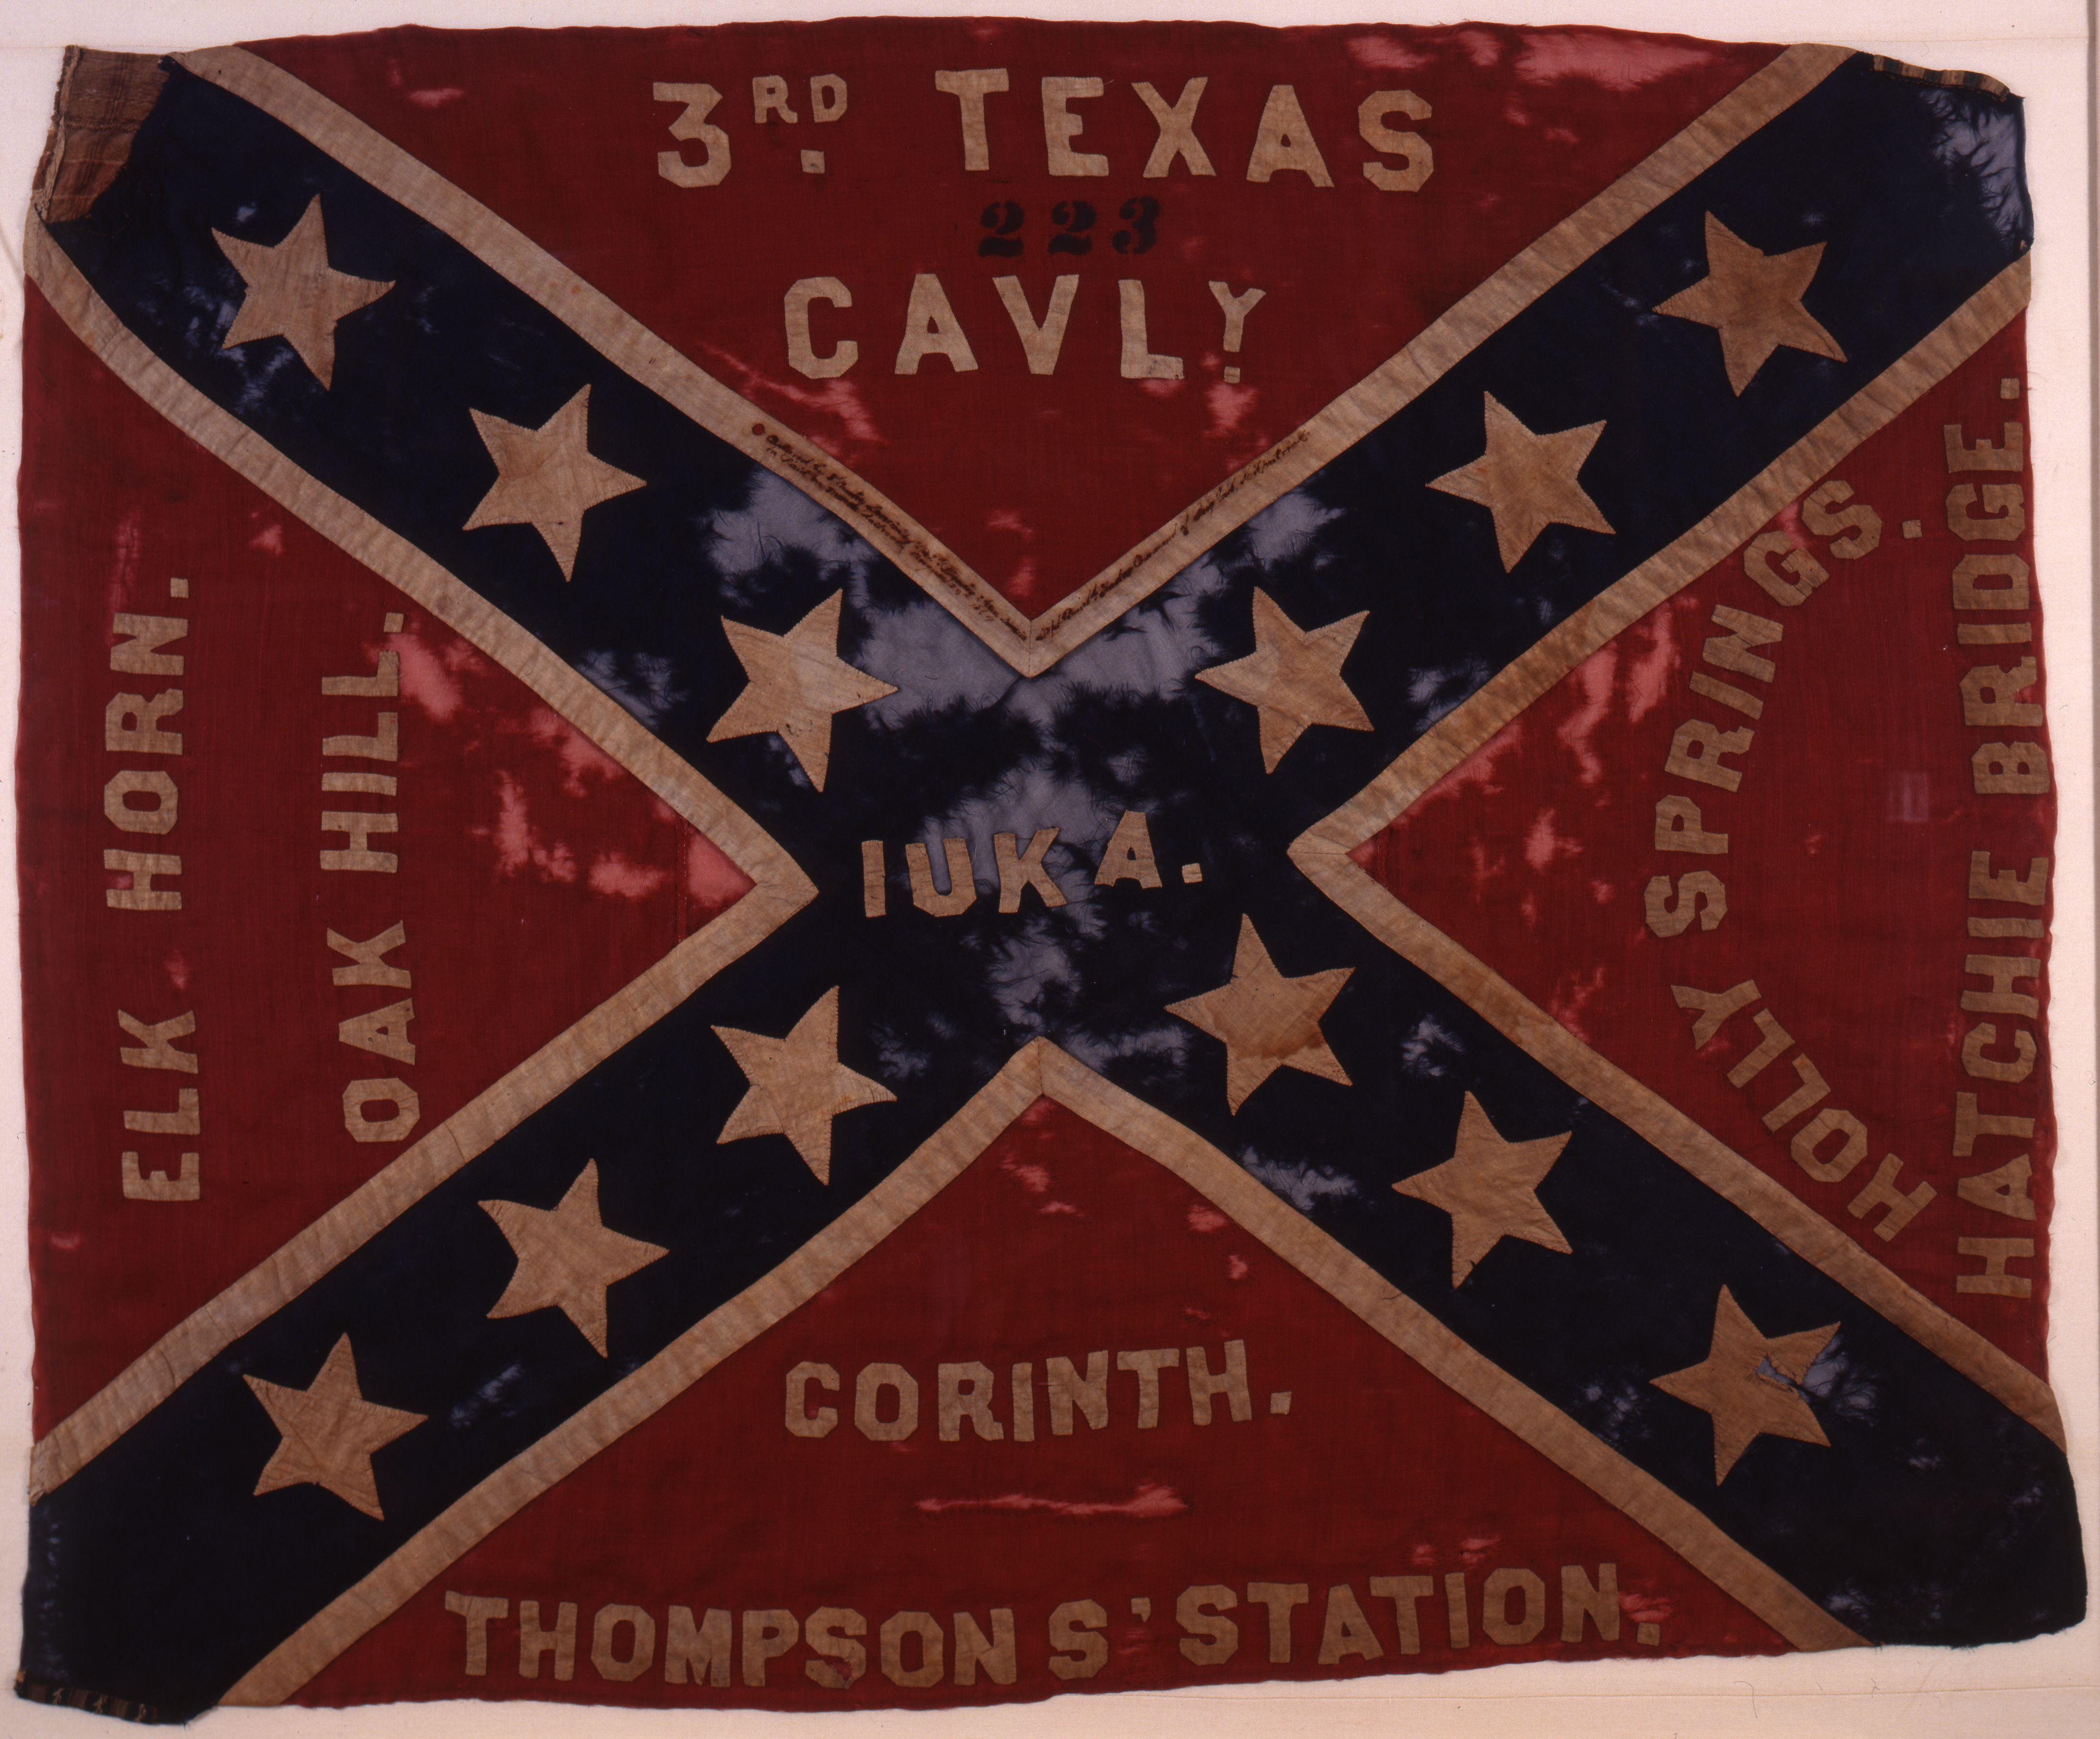 Battle Flag of the 3rd Texas Cav.